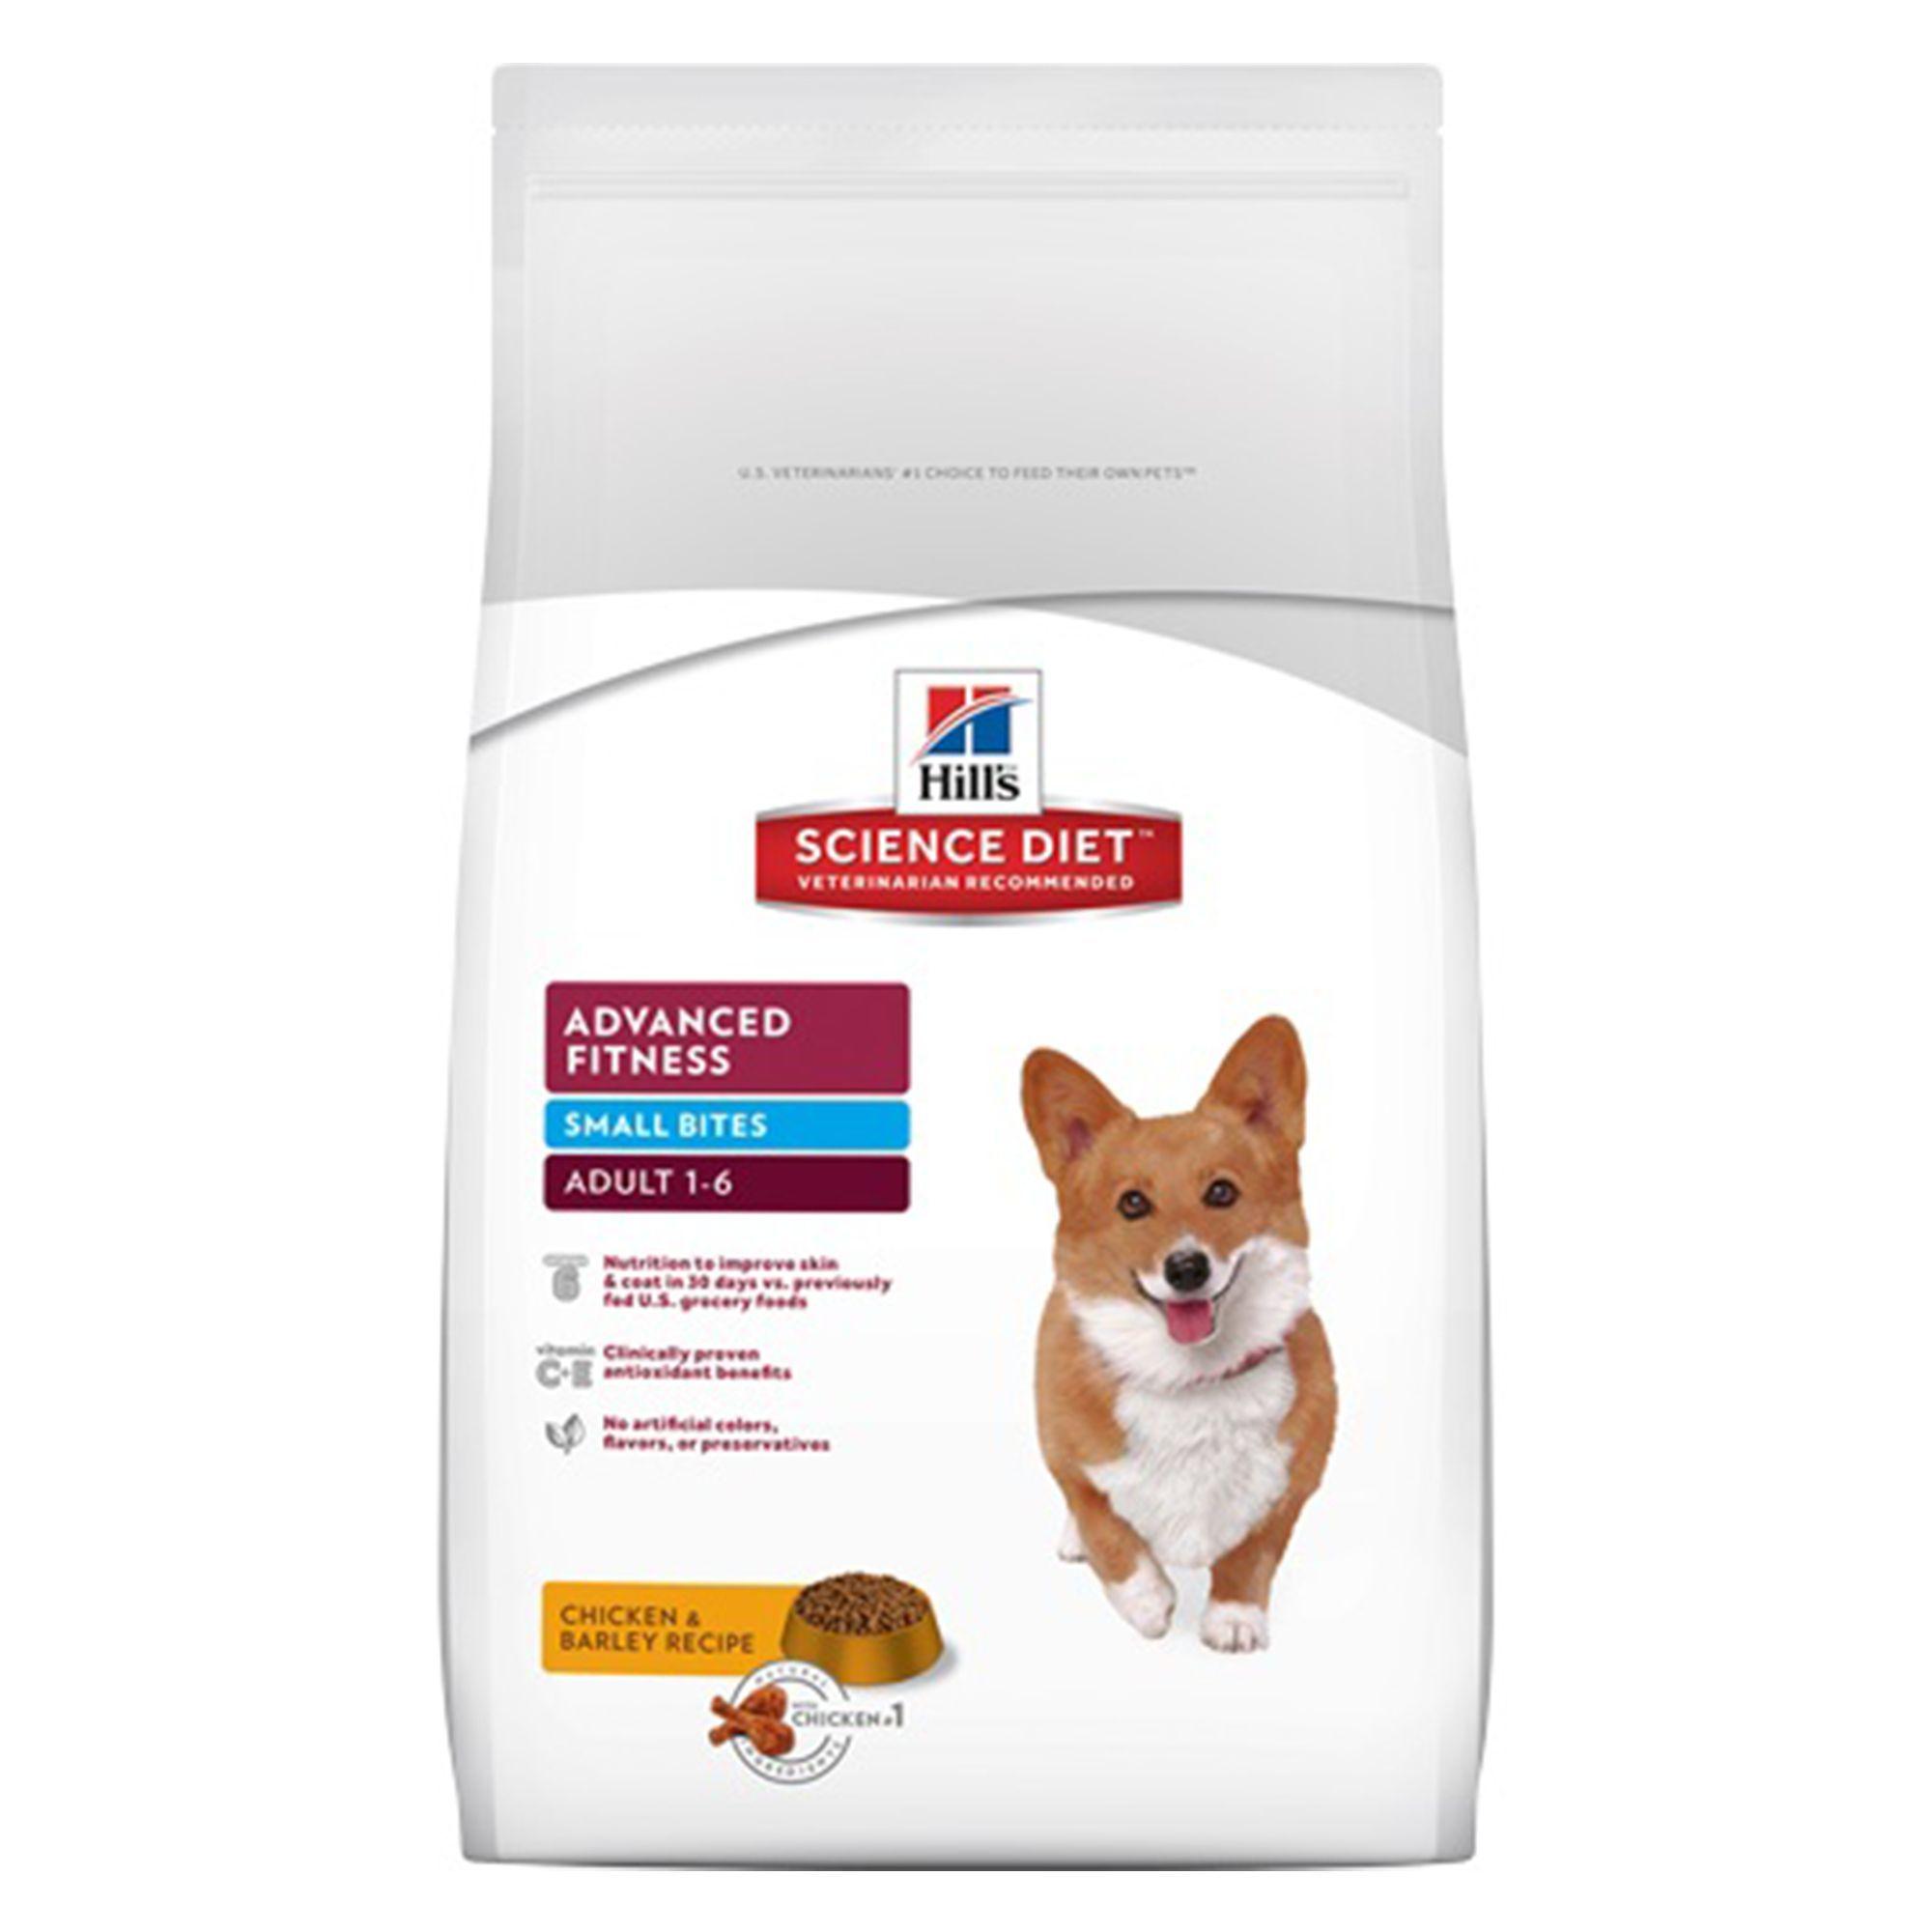 Hill S Science Diet Advanced Fitness Small Bites Adult Dog Food